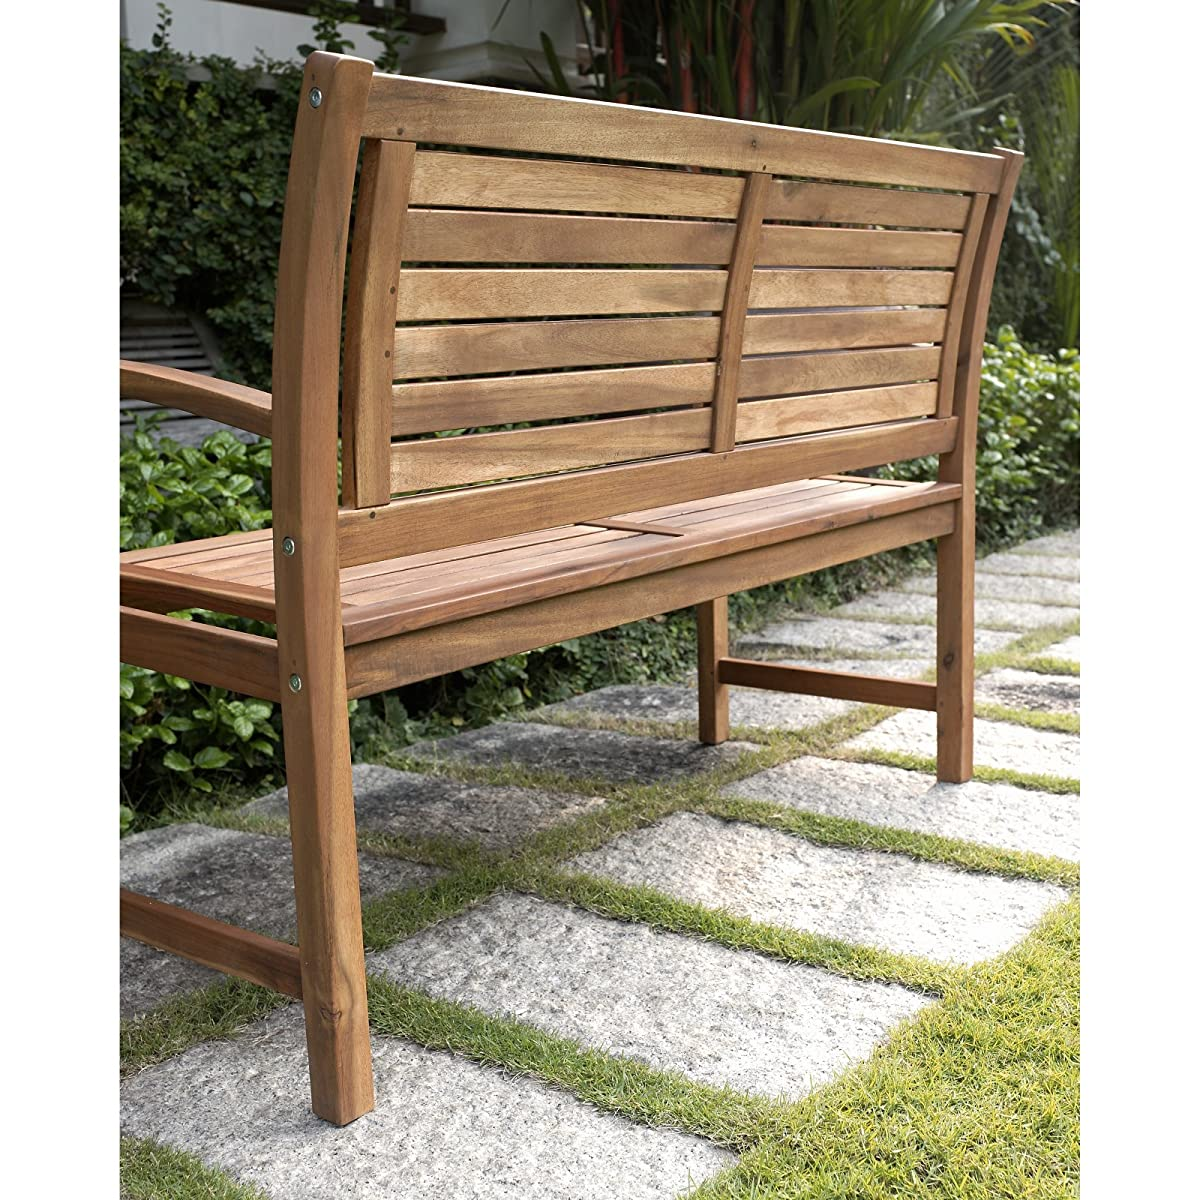 Coral Coast Coral Coast Norwood 4 ft. Horizontal Slat Back Outdoor Wood Garden Bench, Medium Wood, Wood